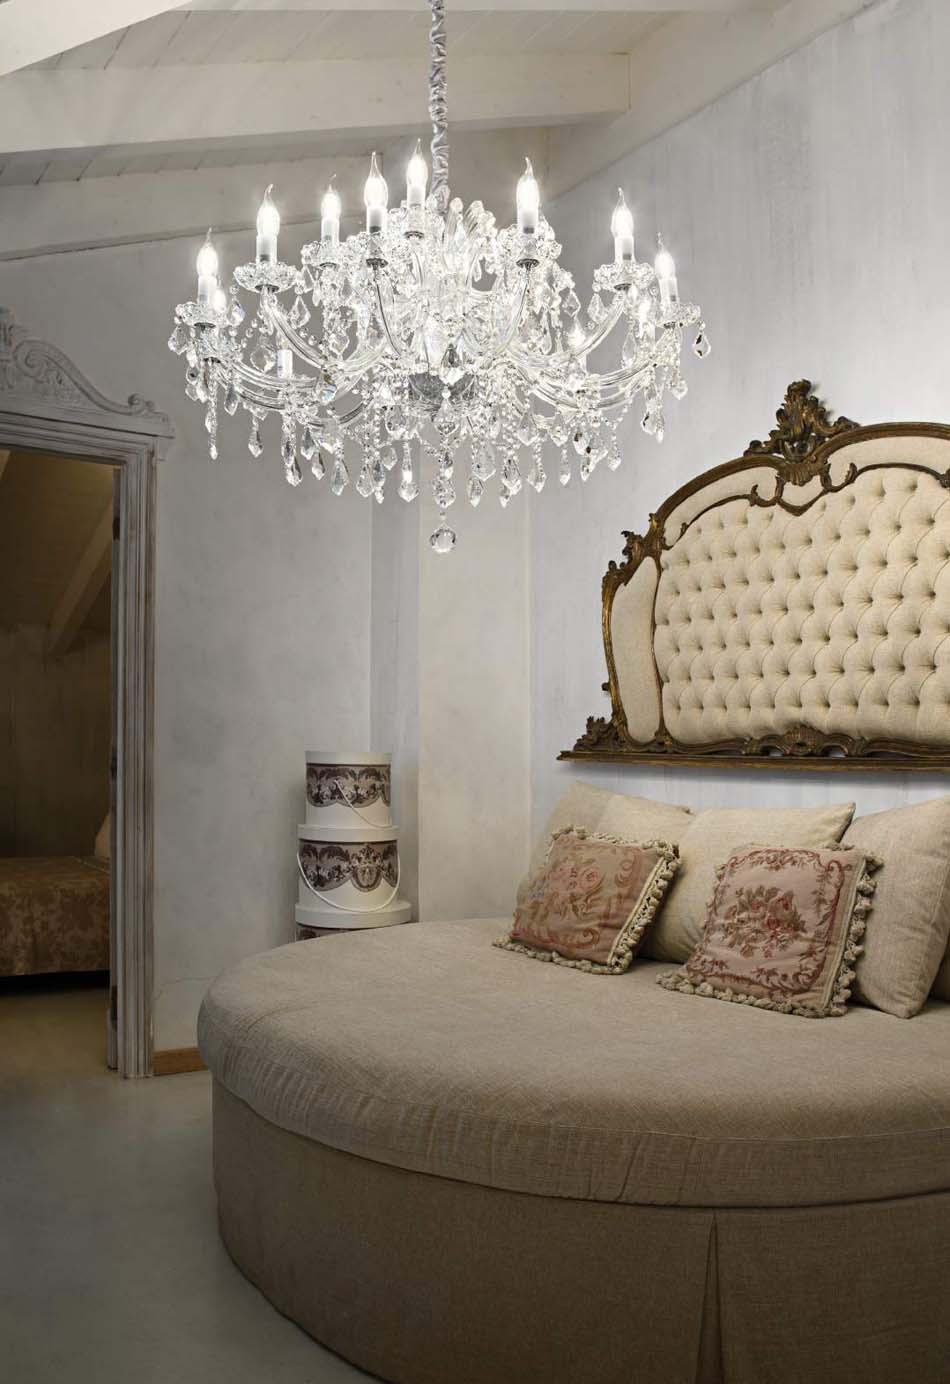 Lampade 31 sospese vintage Ideal Lux napoleon – Toscana Arredamenti